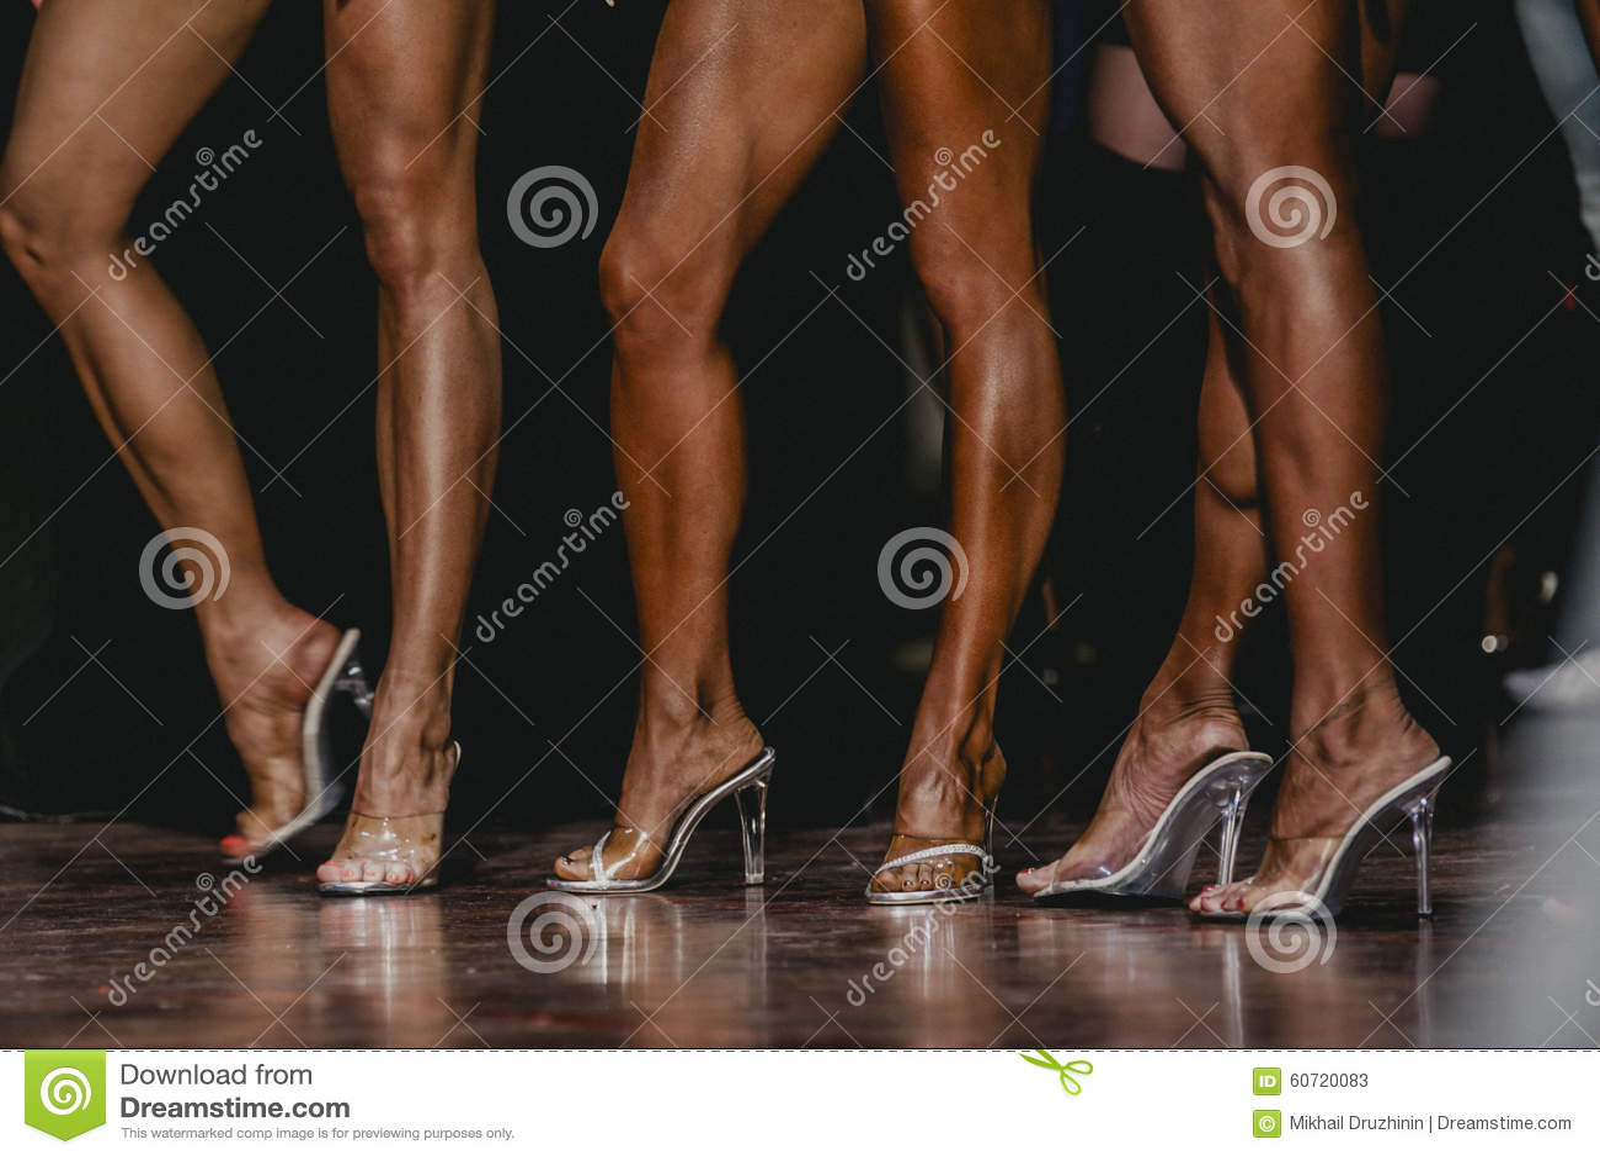 srilankan women hairy pussy